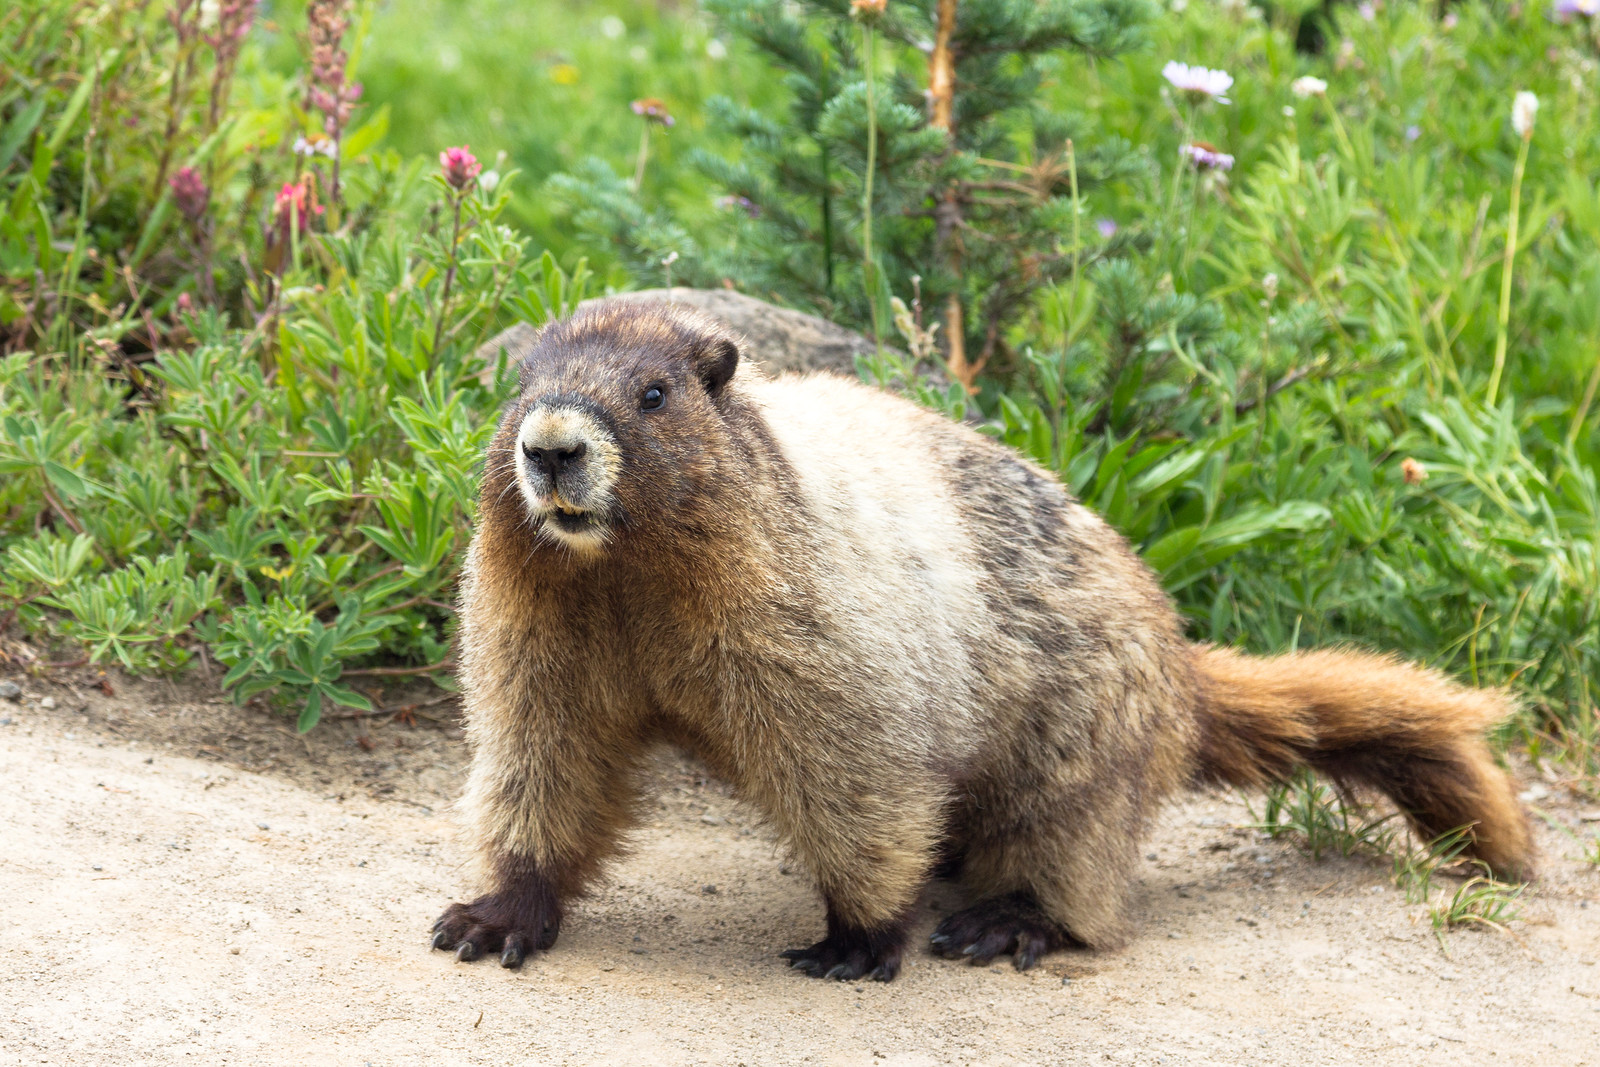 Nora's Marmot Quest '17